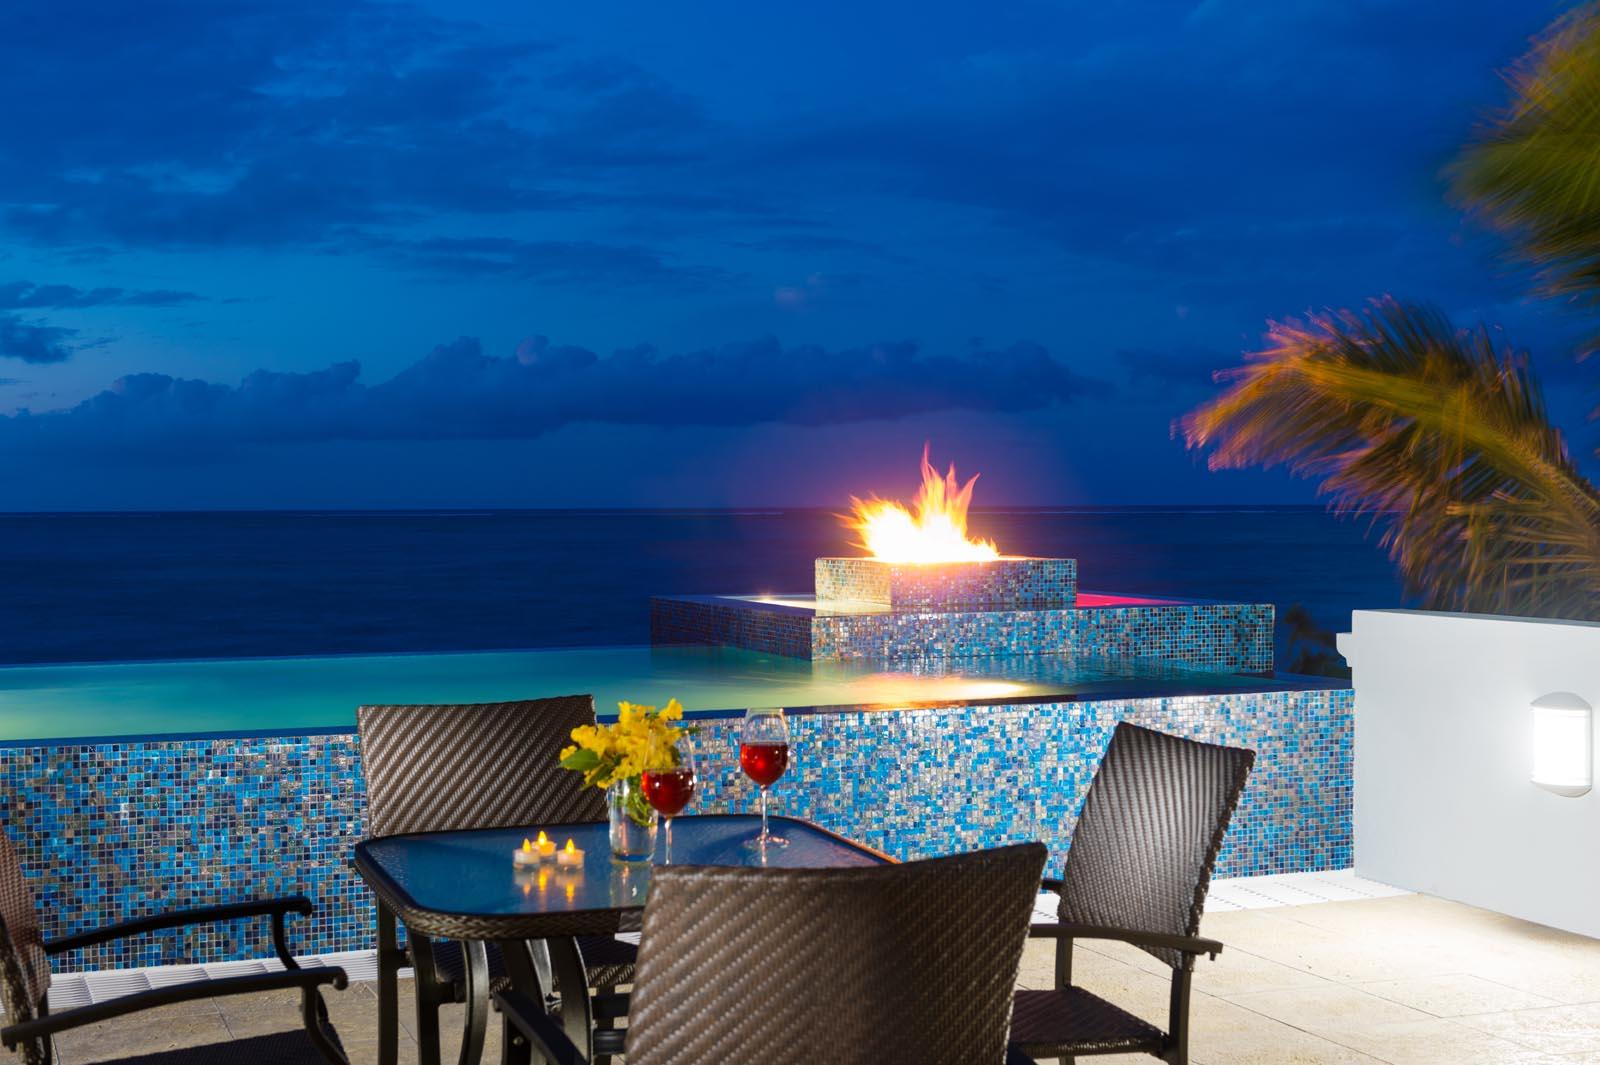 caribique villa rentals announces new contemporary turks and